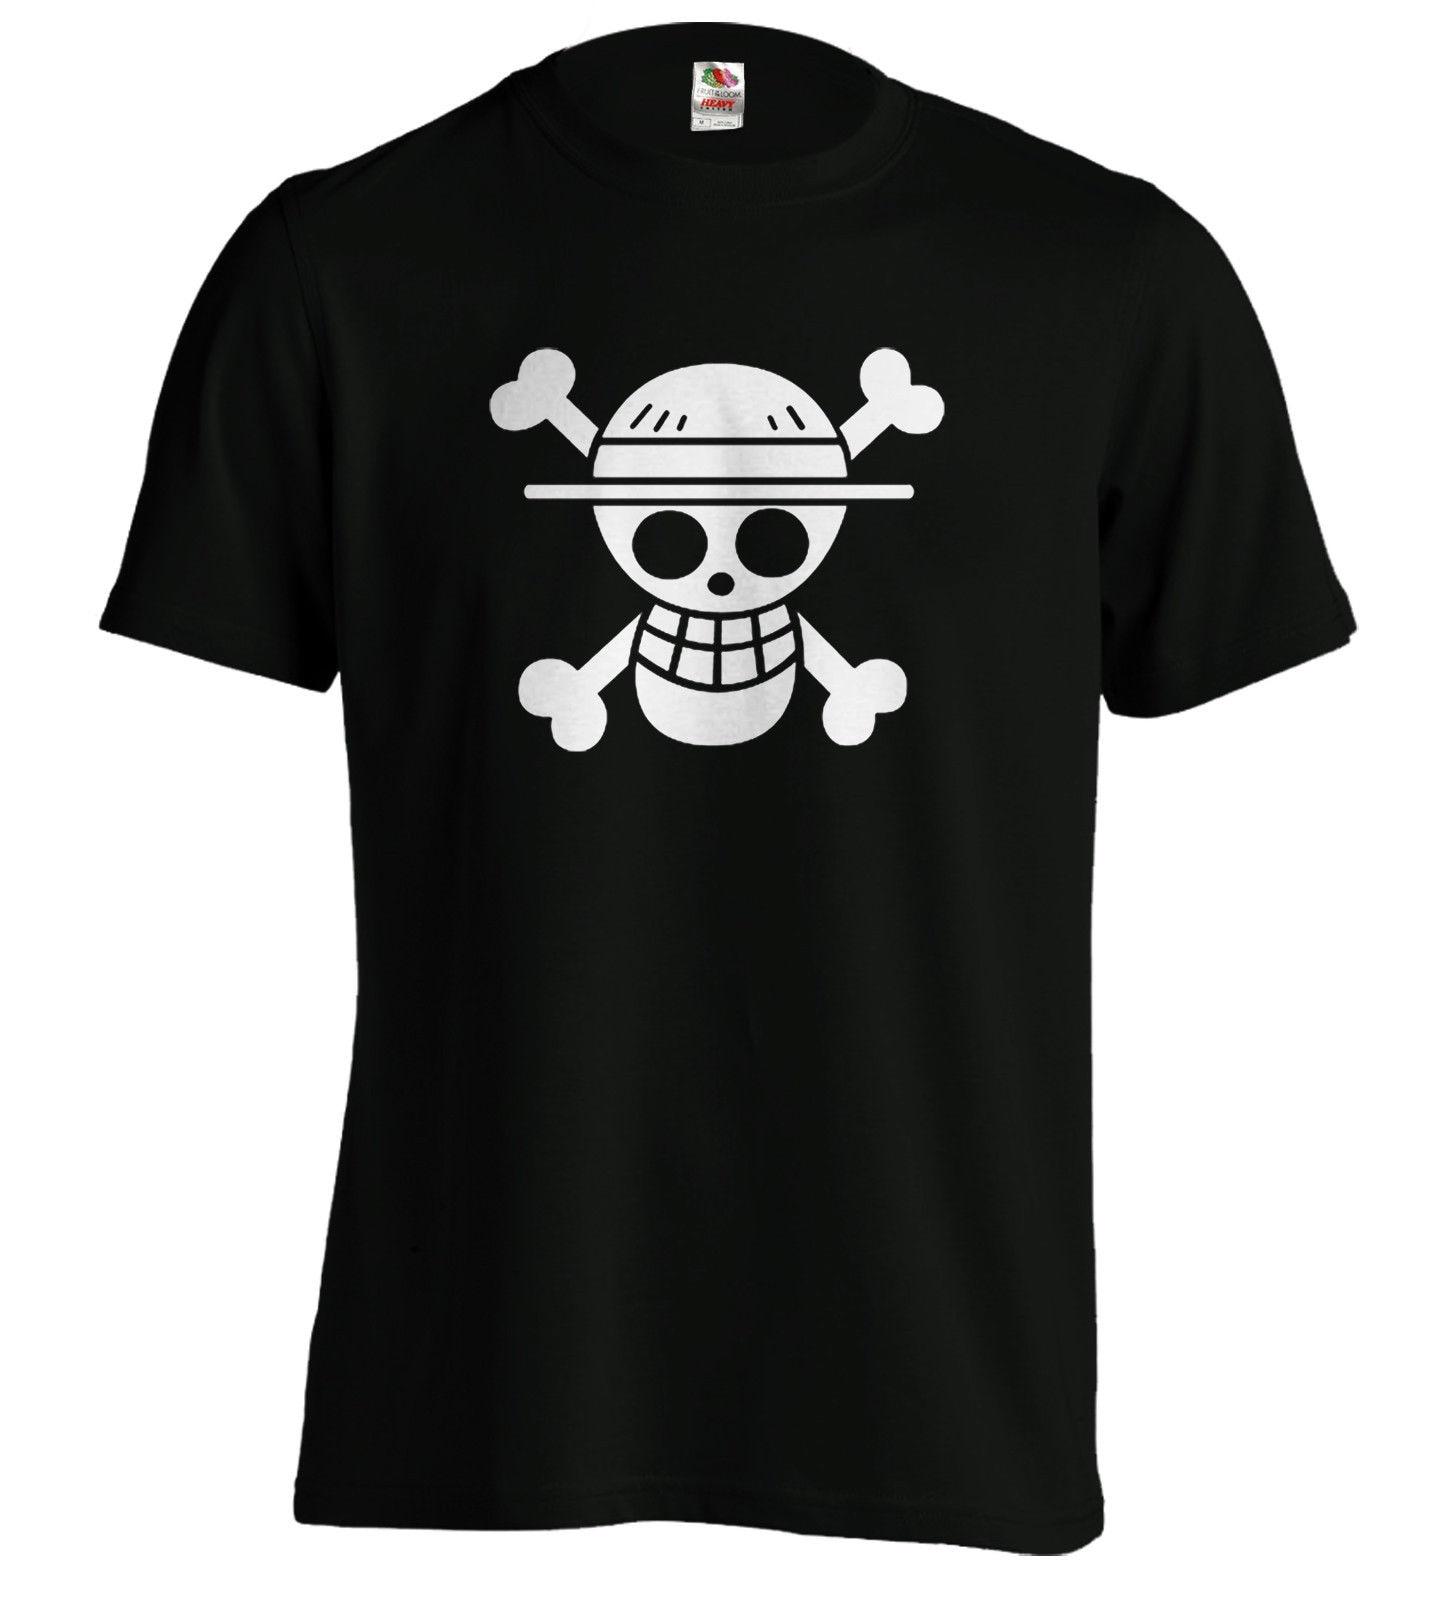 Onepiece TShirt Straw Hat Crew Flag Luffy Pirates anime